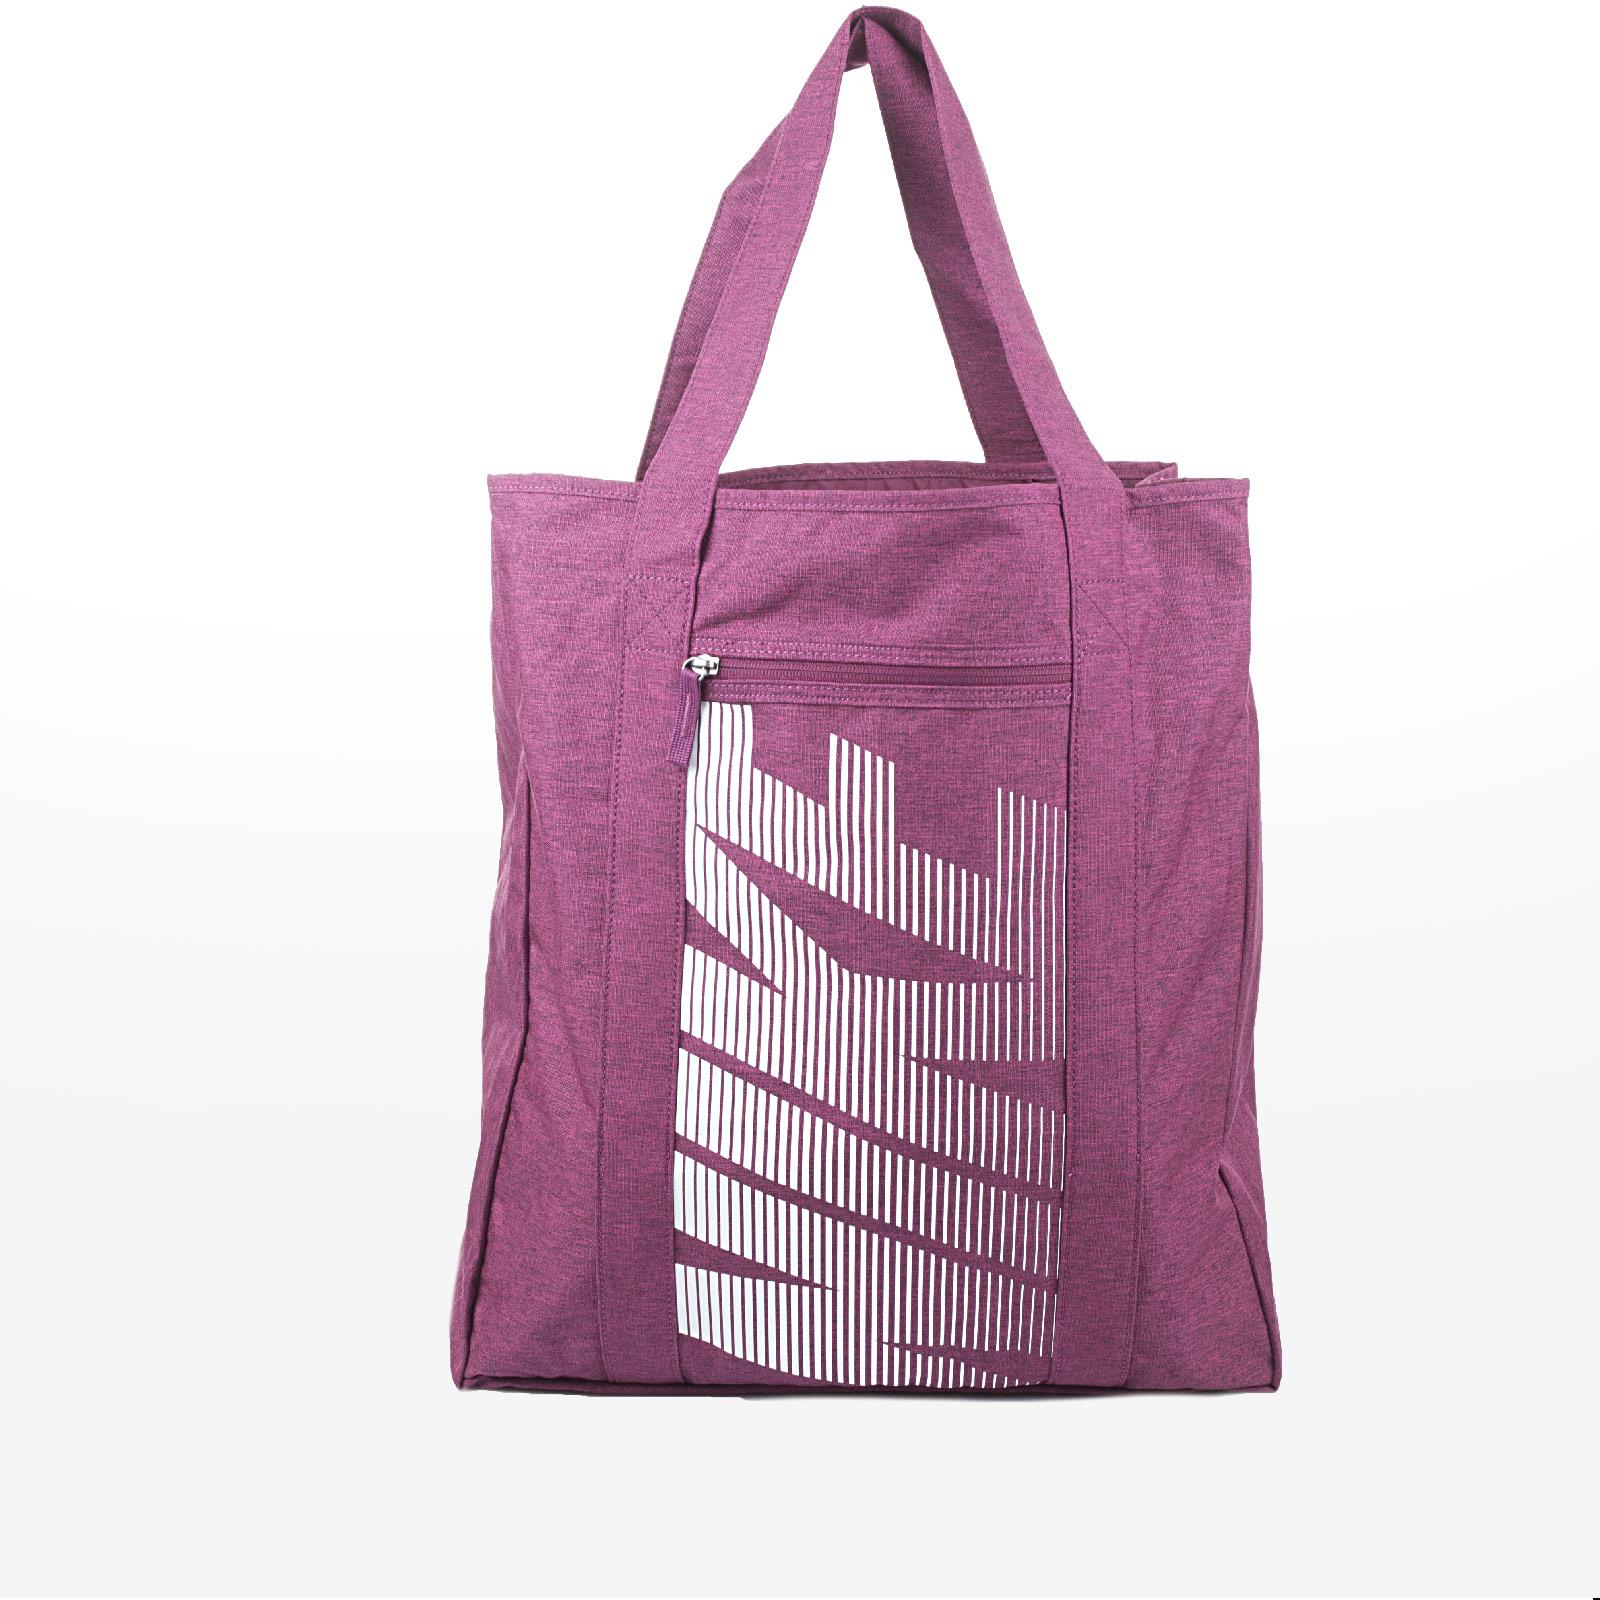 Nike - W NK GYM TOTE - RUSH PINK/RUSH P